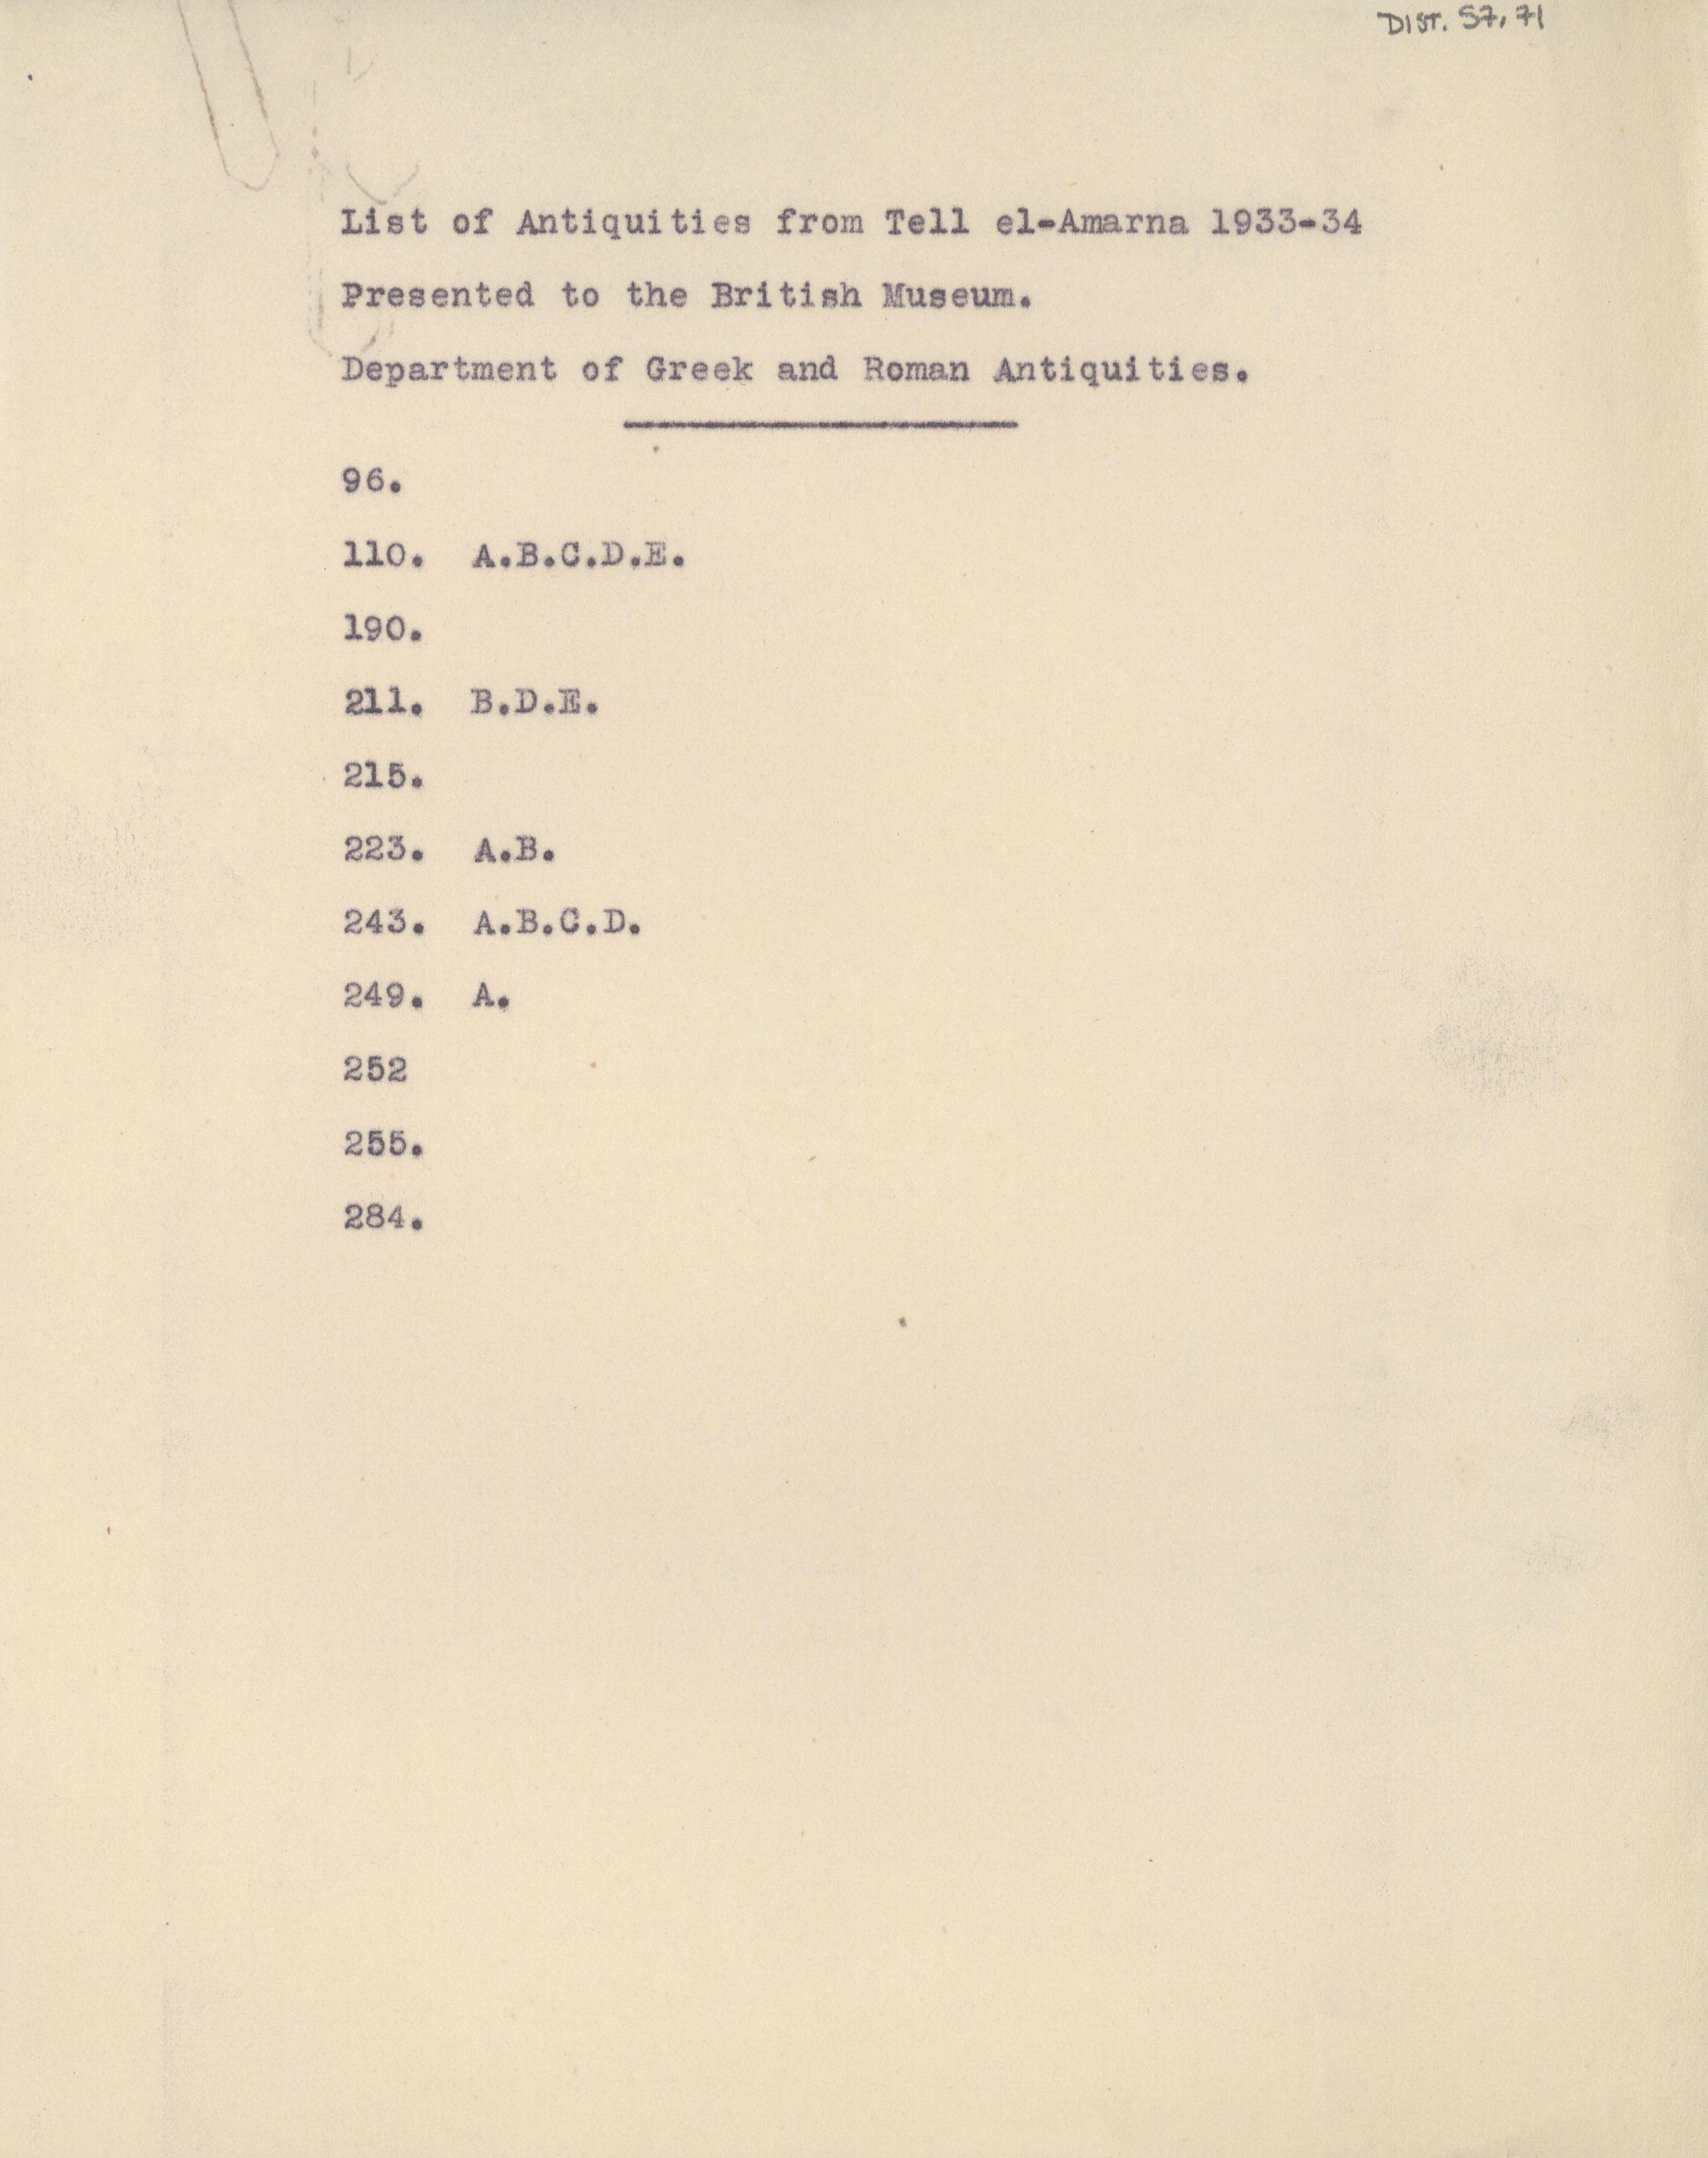 1931-34 el-Amarna DIST.57.71